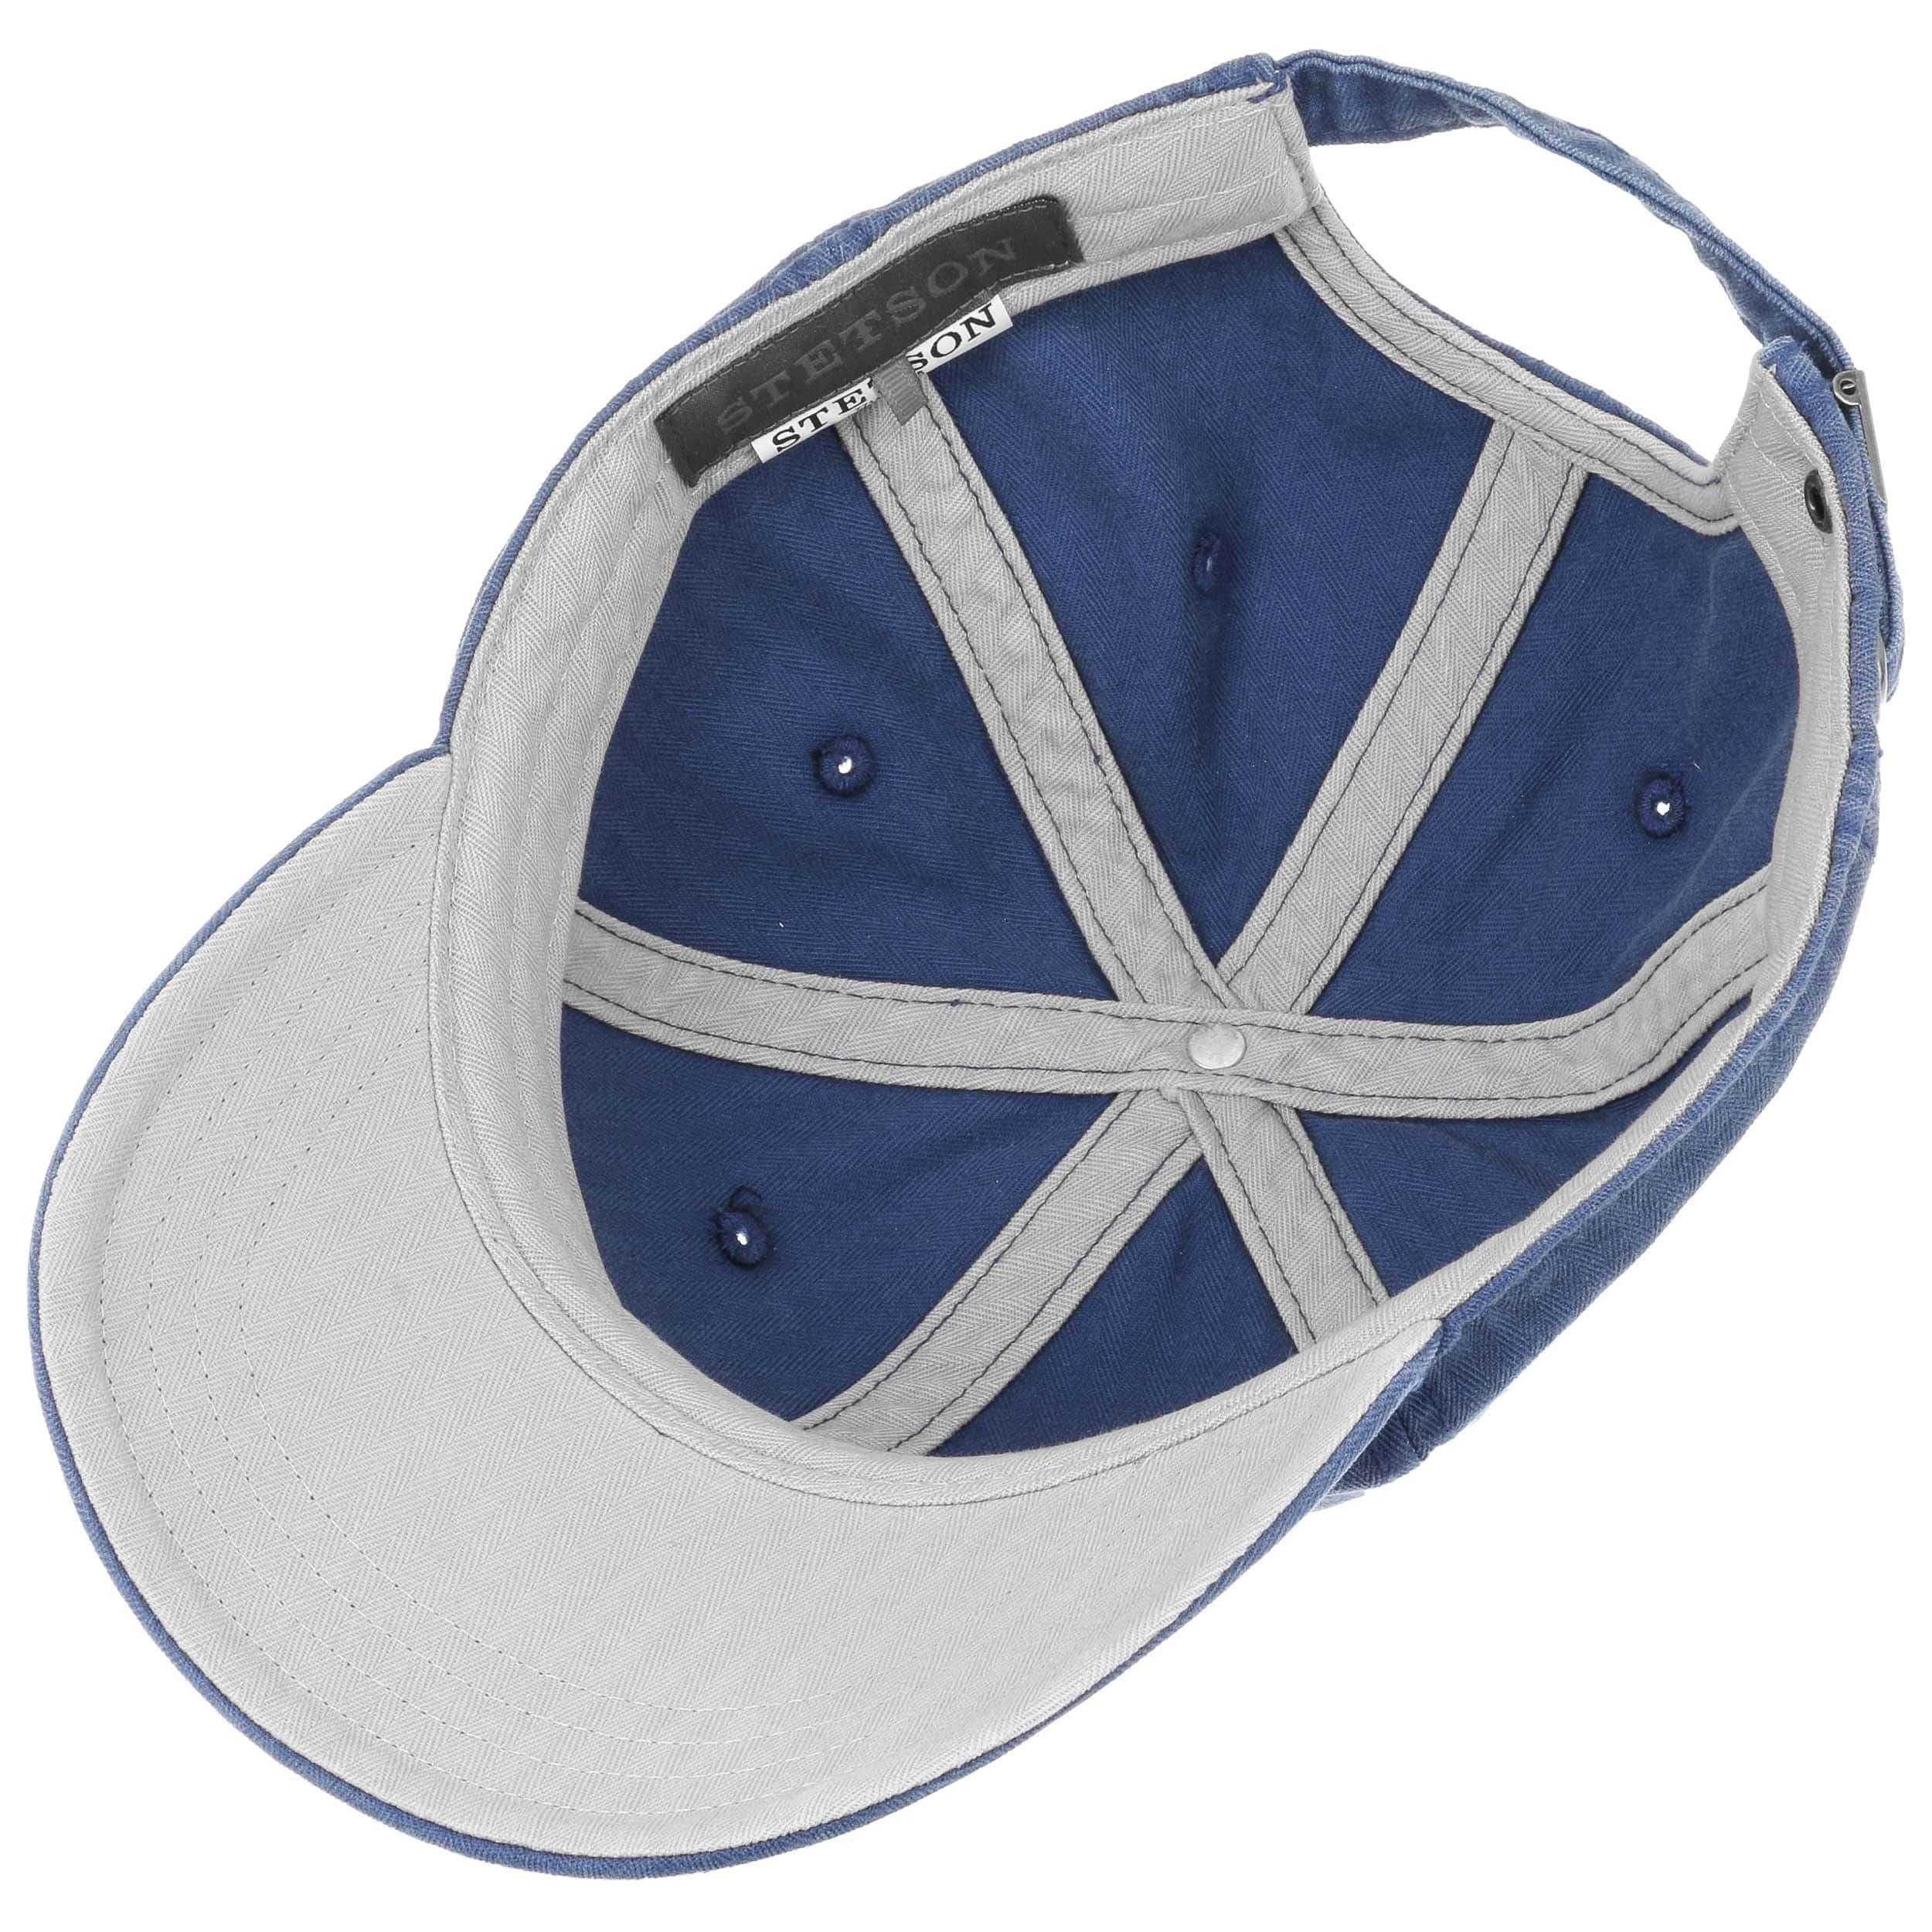 89b7ab47ce8 ... Marshal Cotton Basecap by Stetson - blau-beige 2 ...